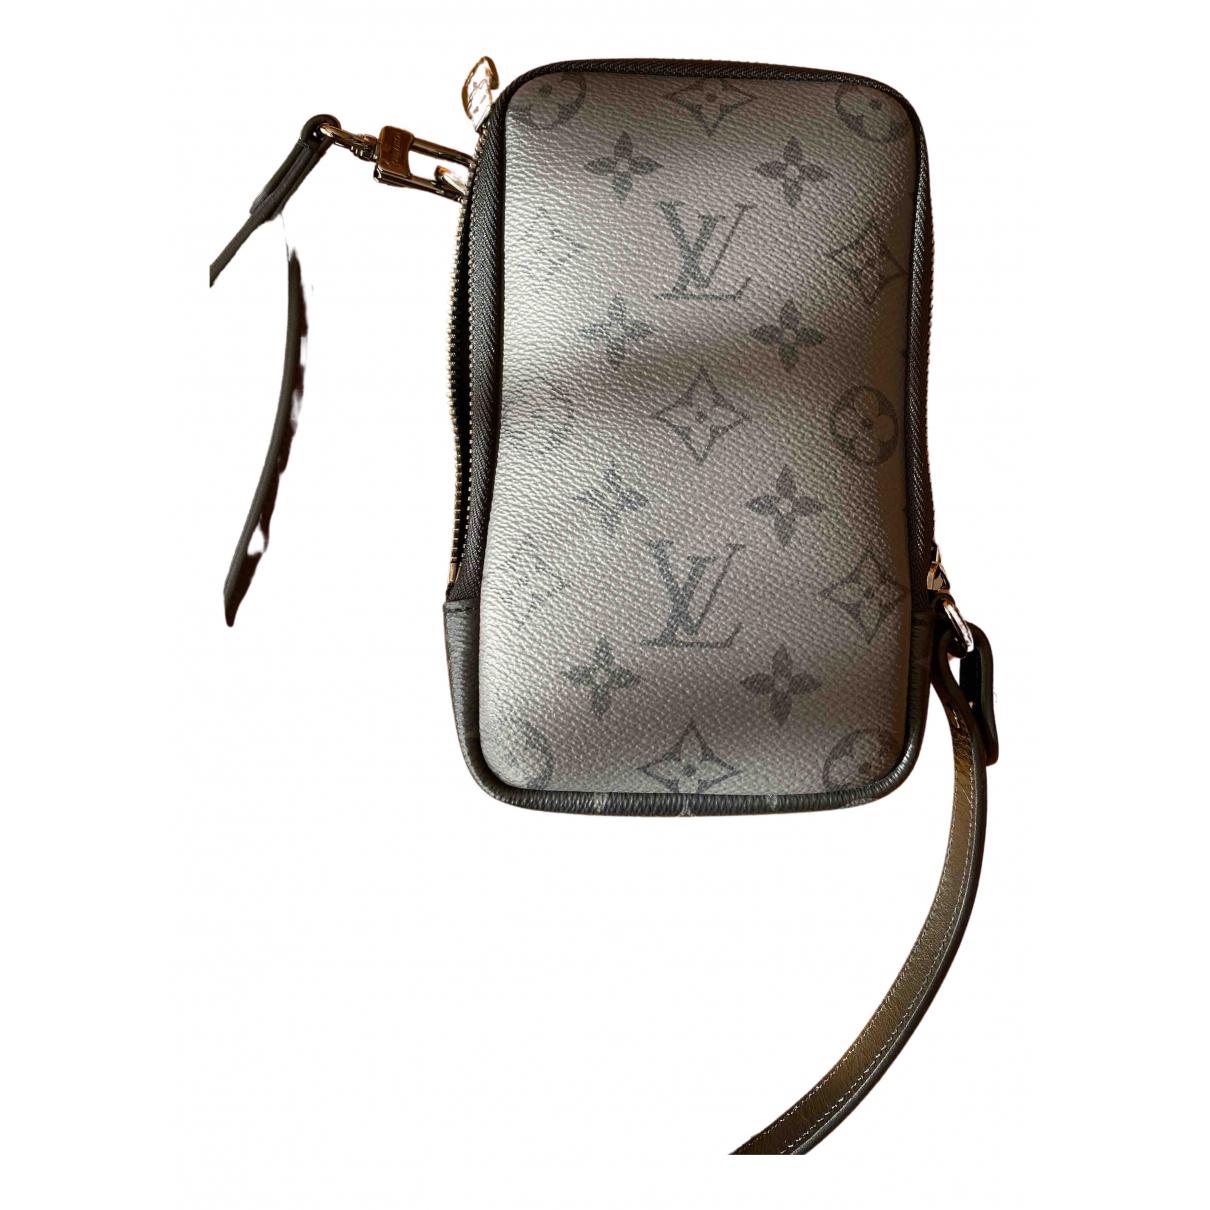 Bolso de viaje de Lona Louis Vuitton